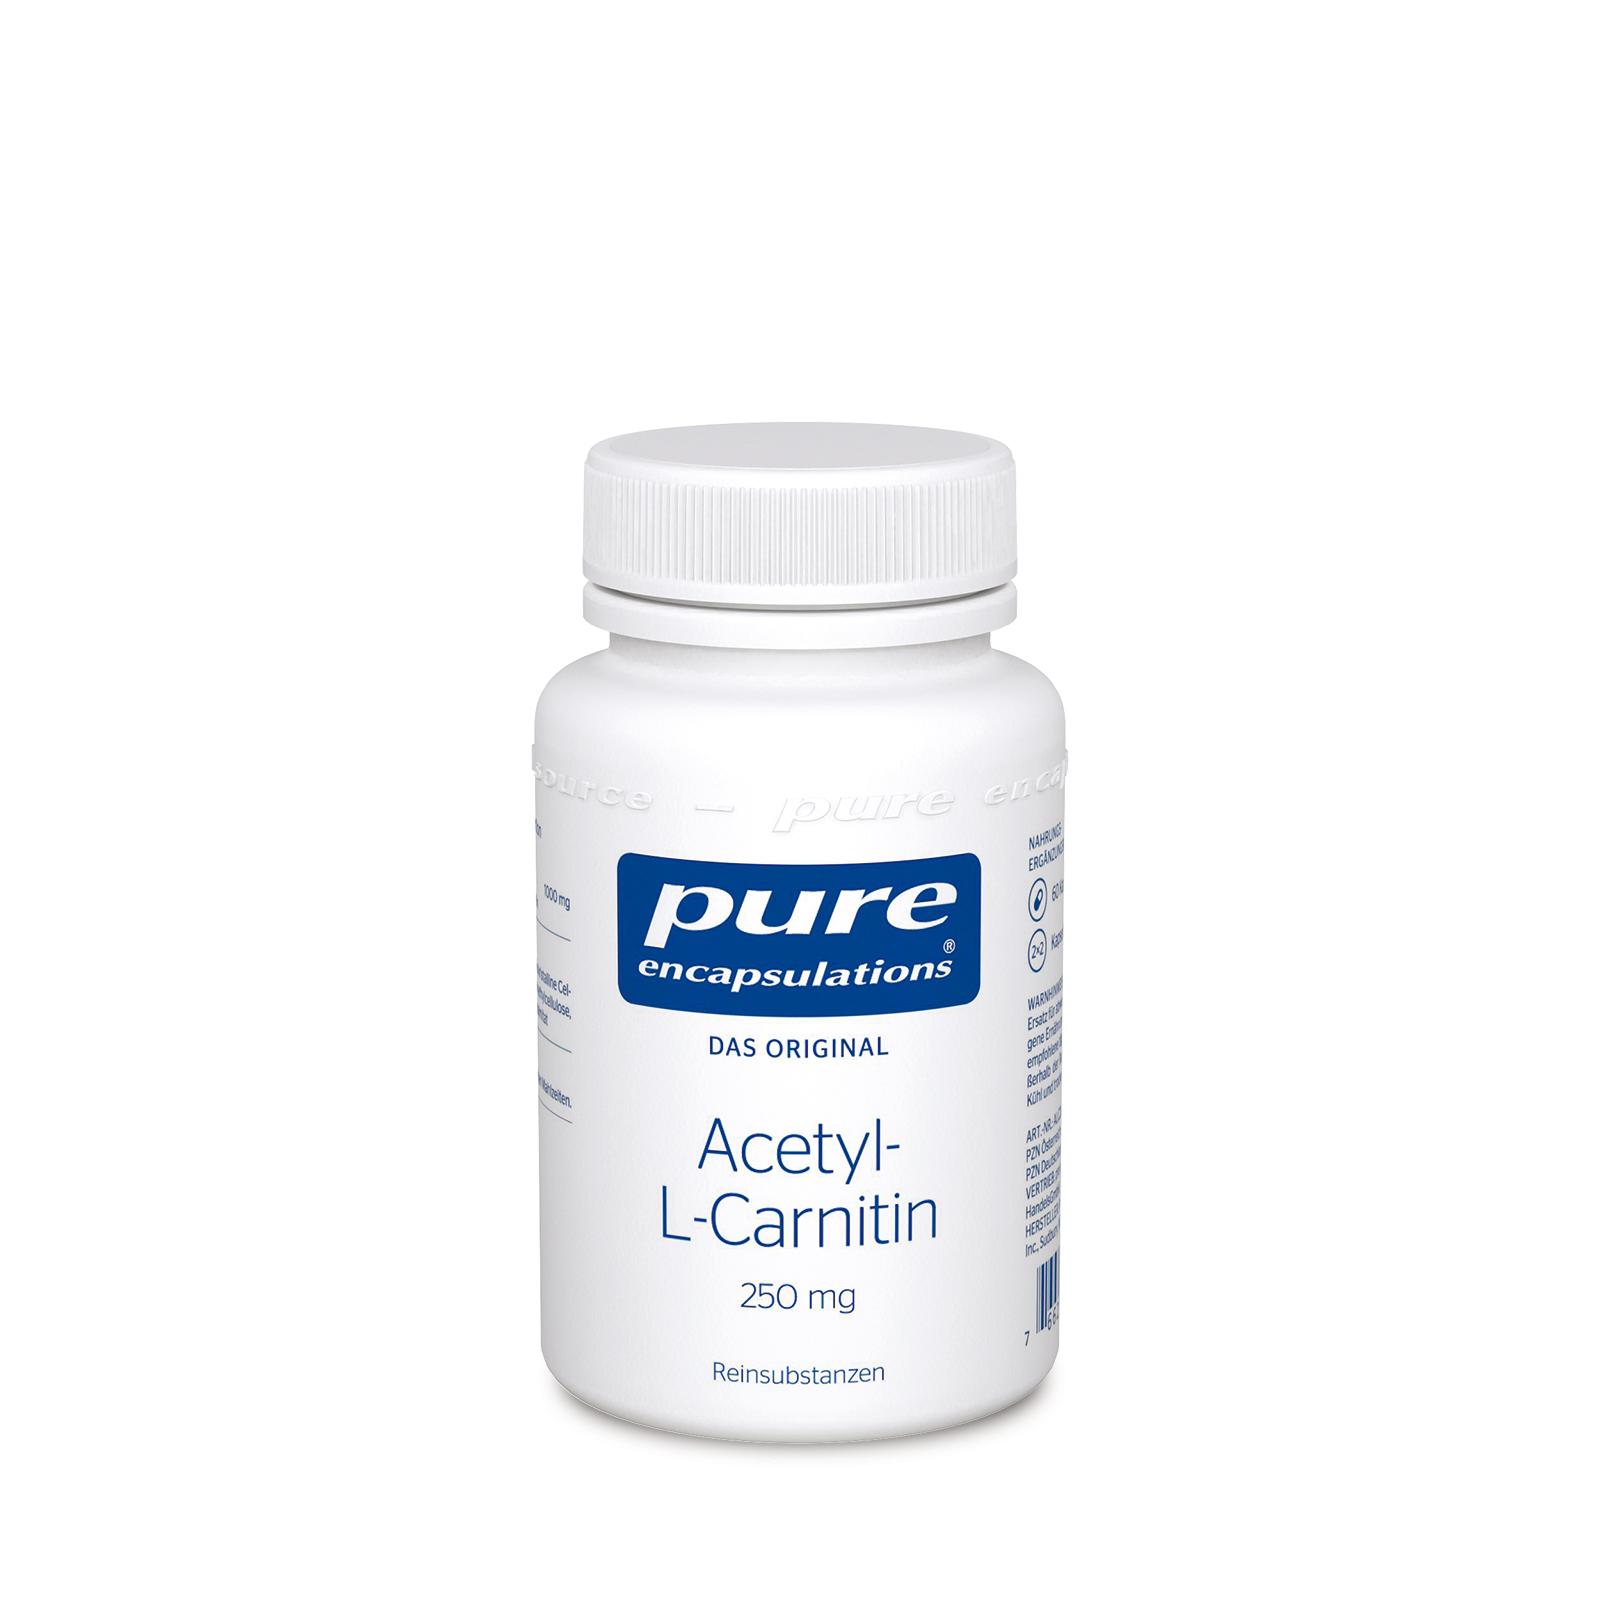 pure encapsulations® Acetyl-L-Carnitin